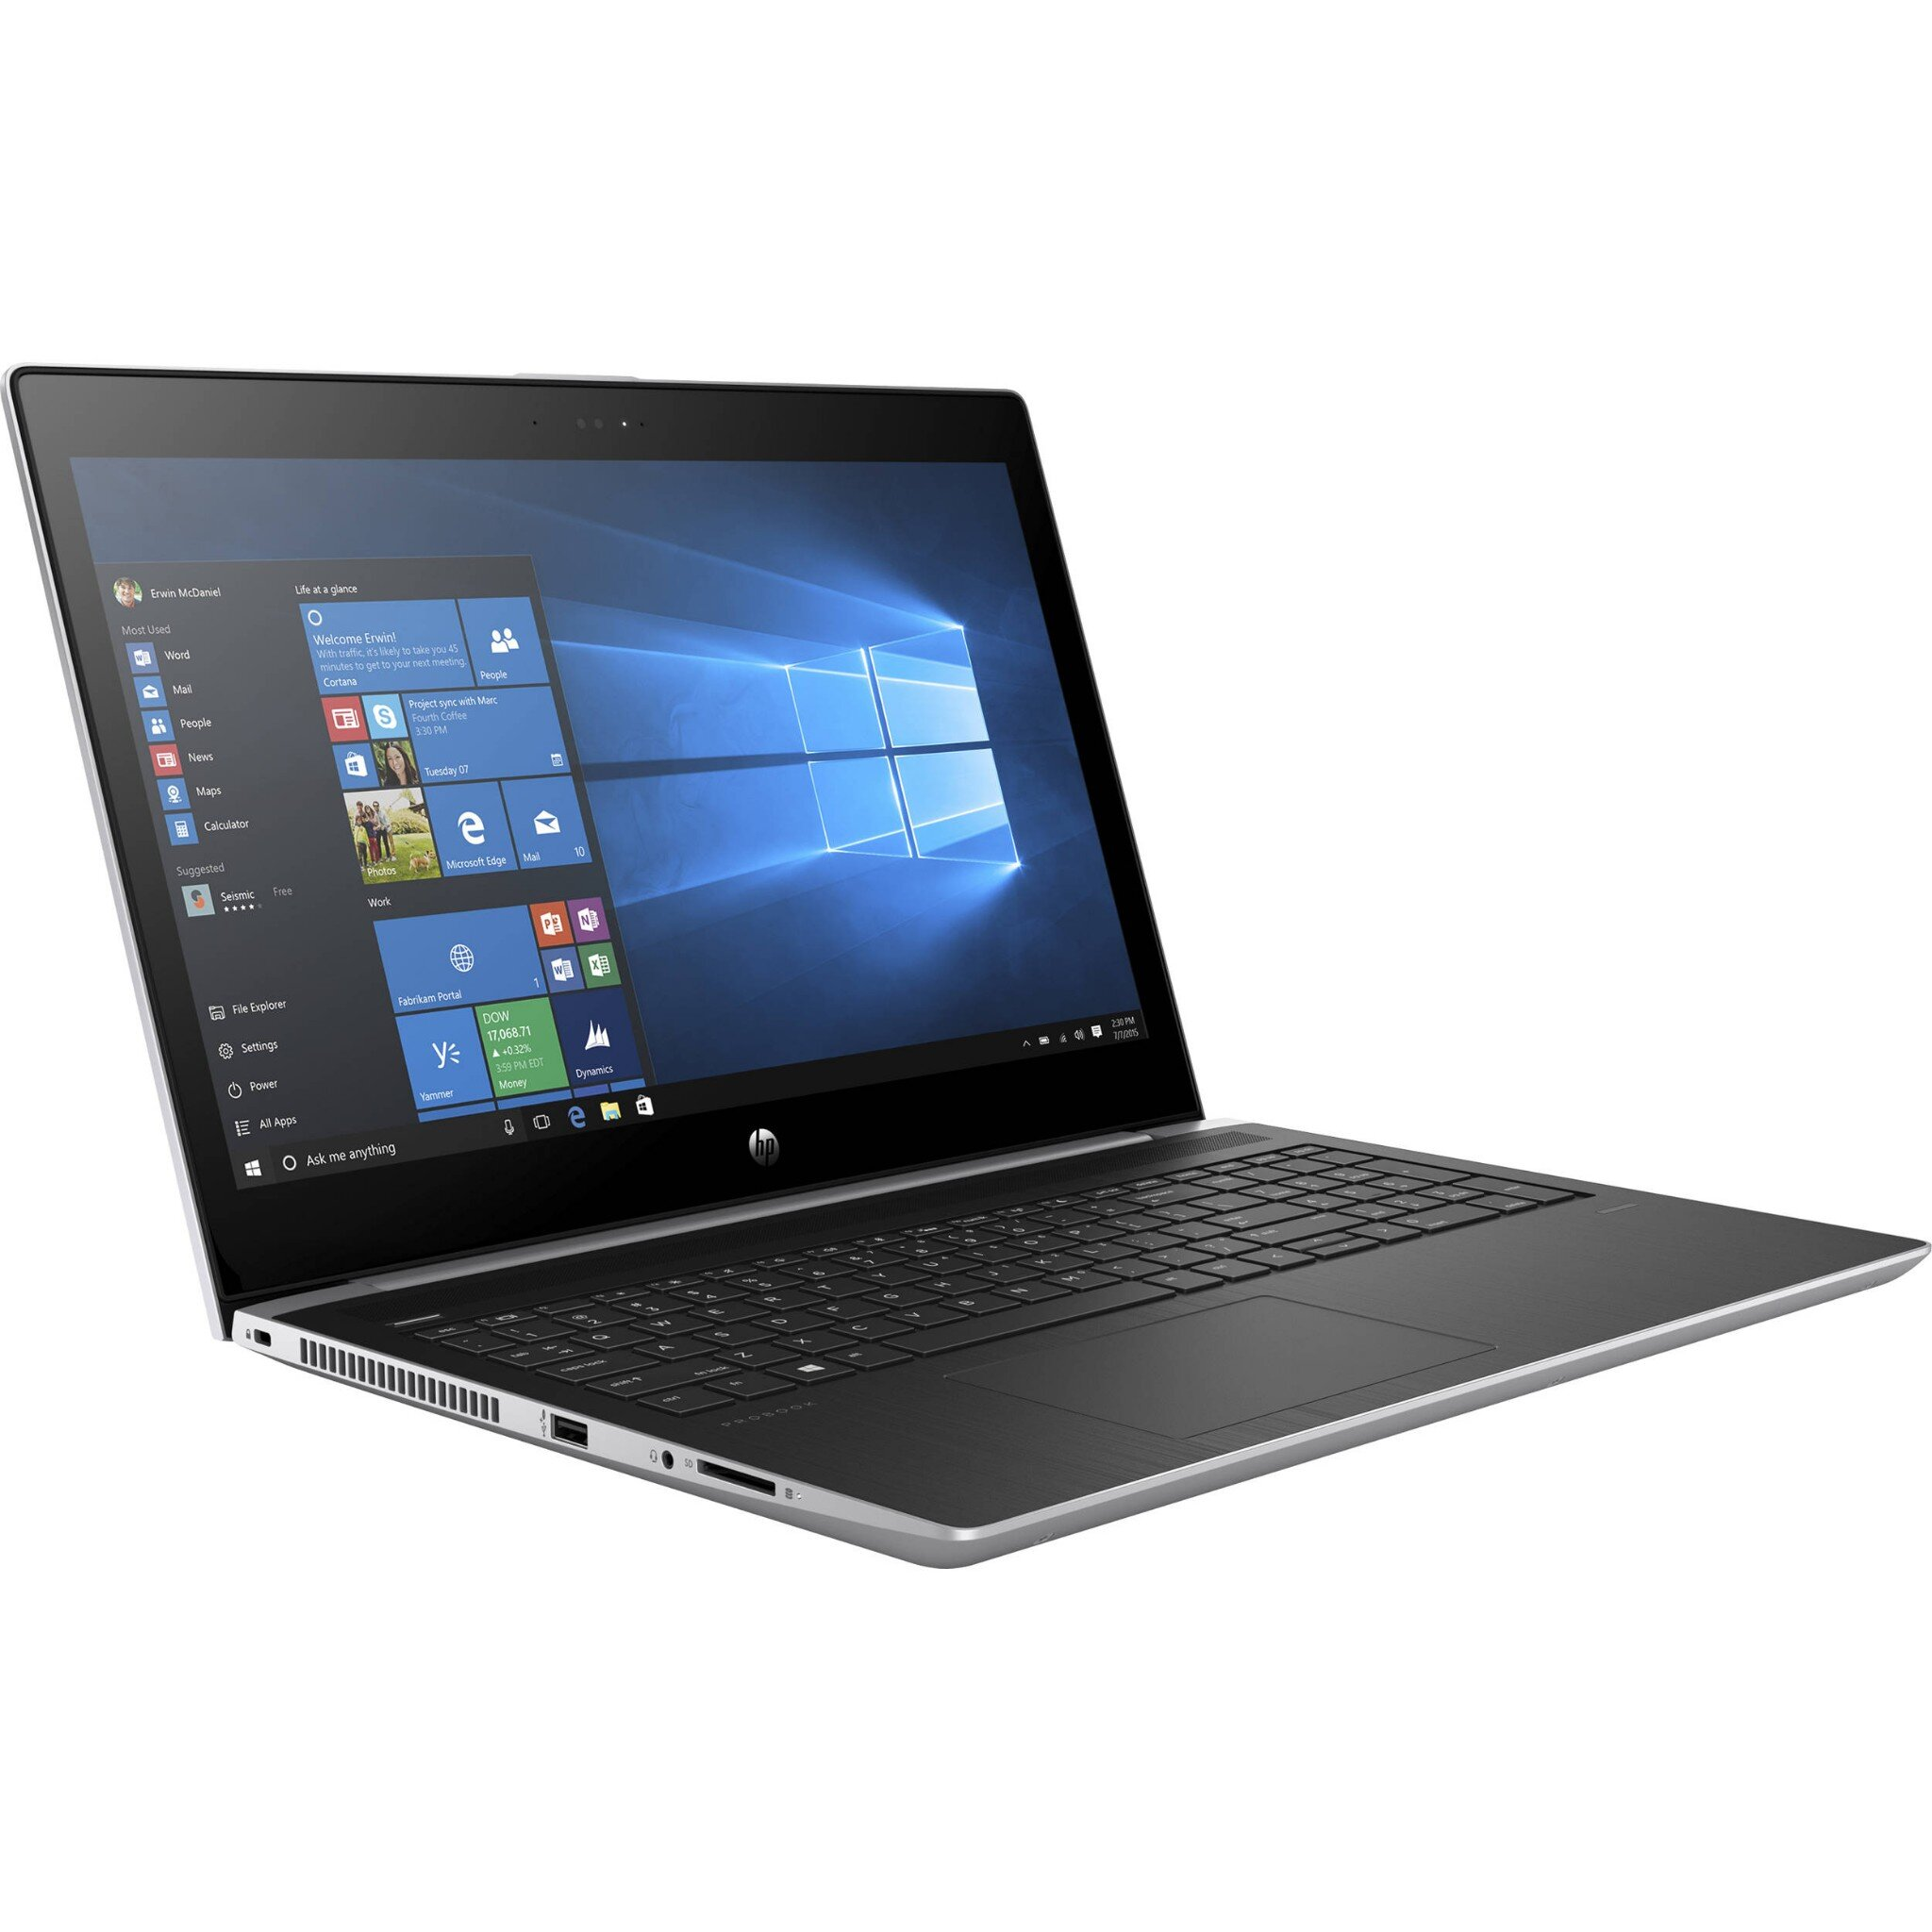 Laptop HP Probook 450 G5 2ZD47PA - Intel core i5, 4GB RAM, SSD 256GB, Nvidia GeForce GT 930MX, 15.6 inch